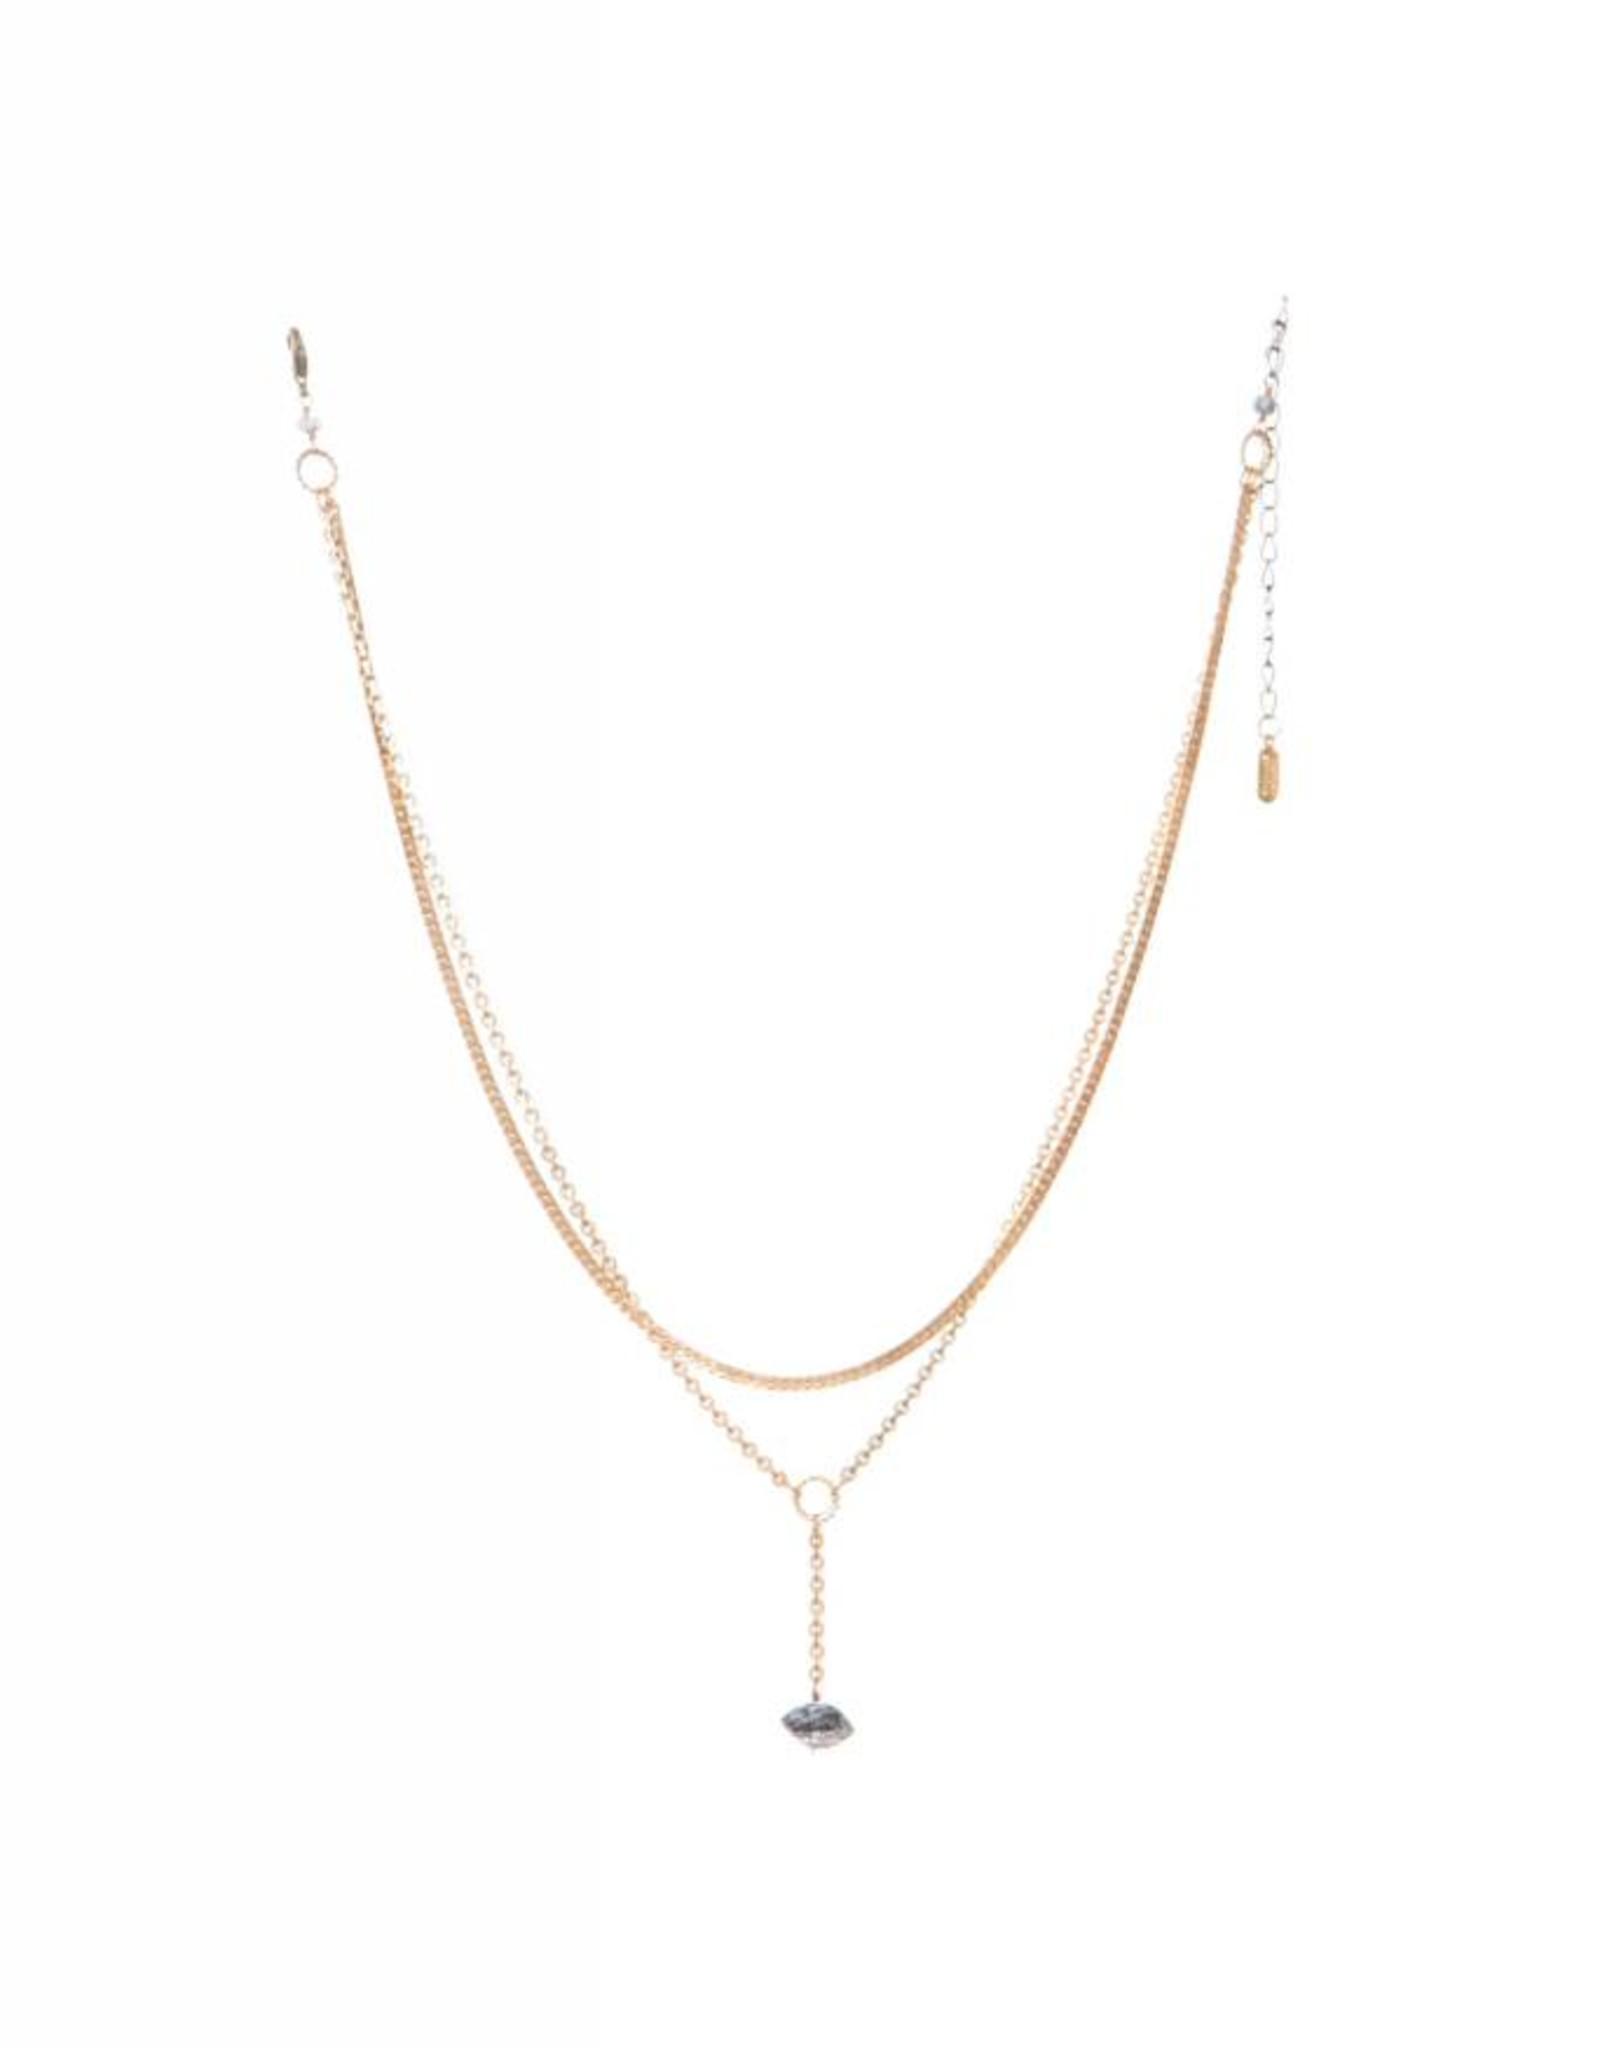 Hailey Gerrits Designs Meri Necklace - Dendrite Opal